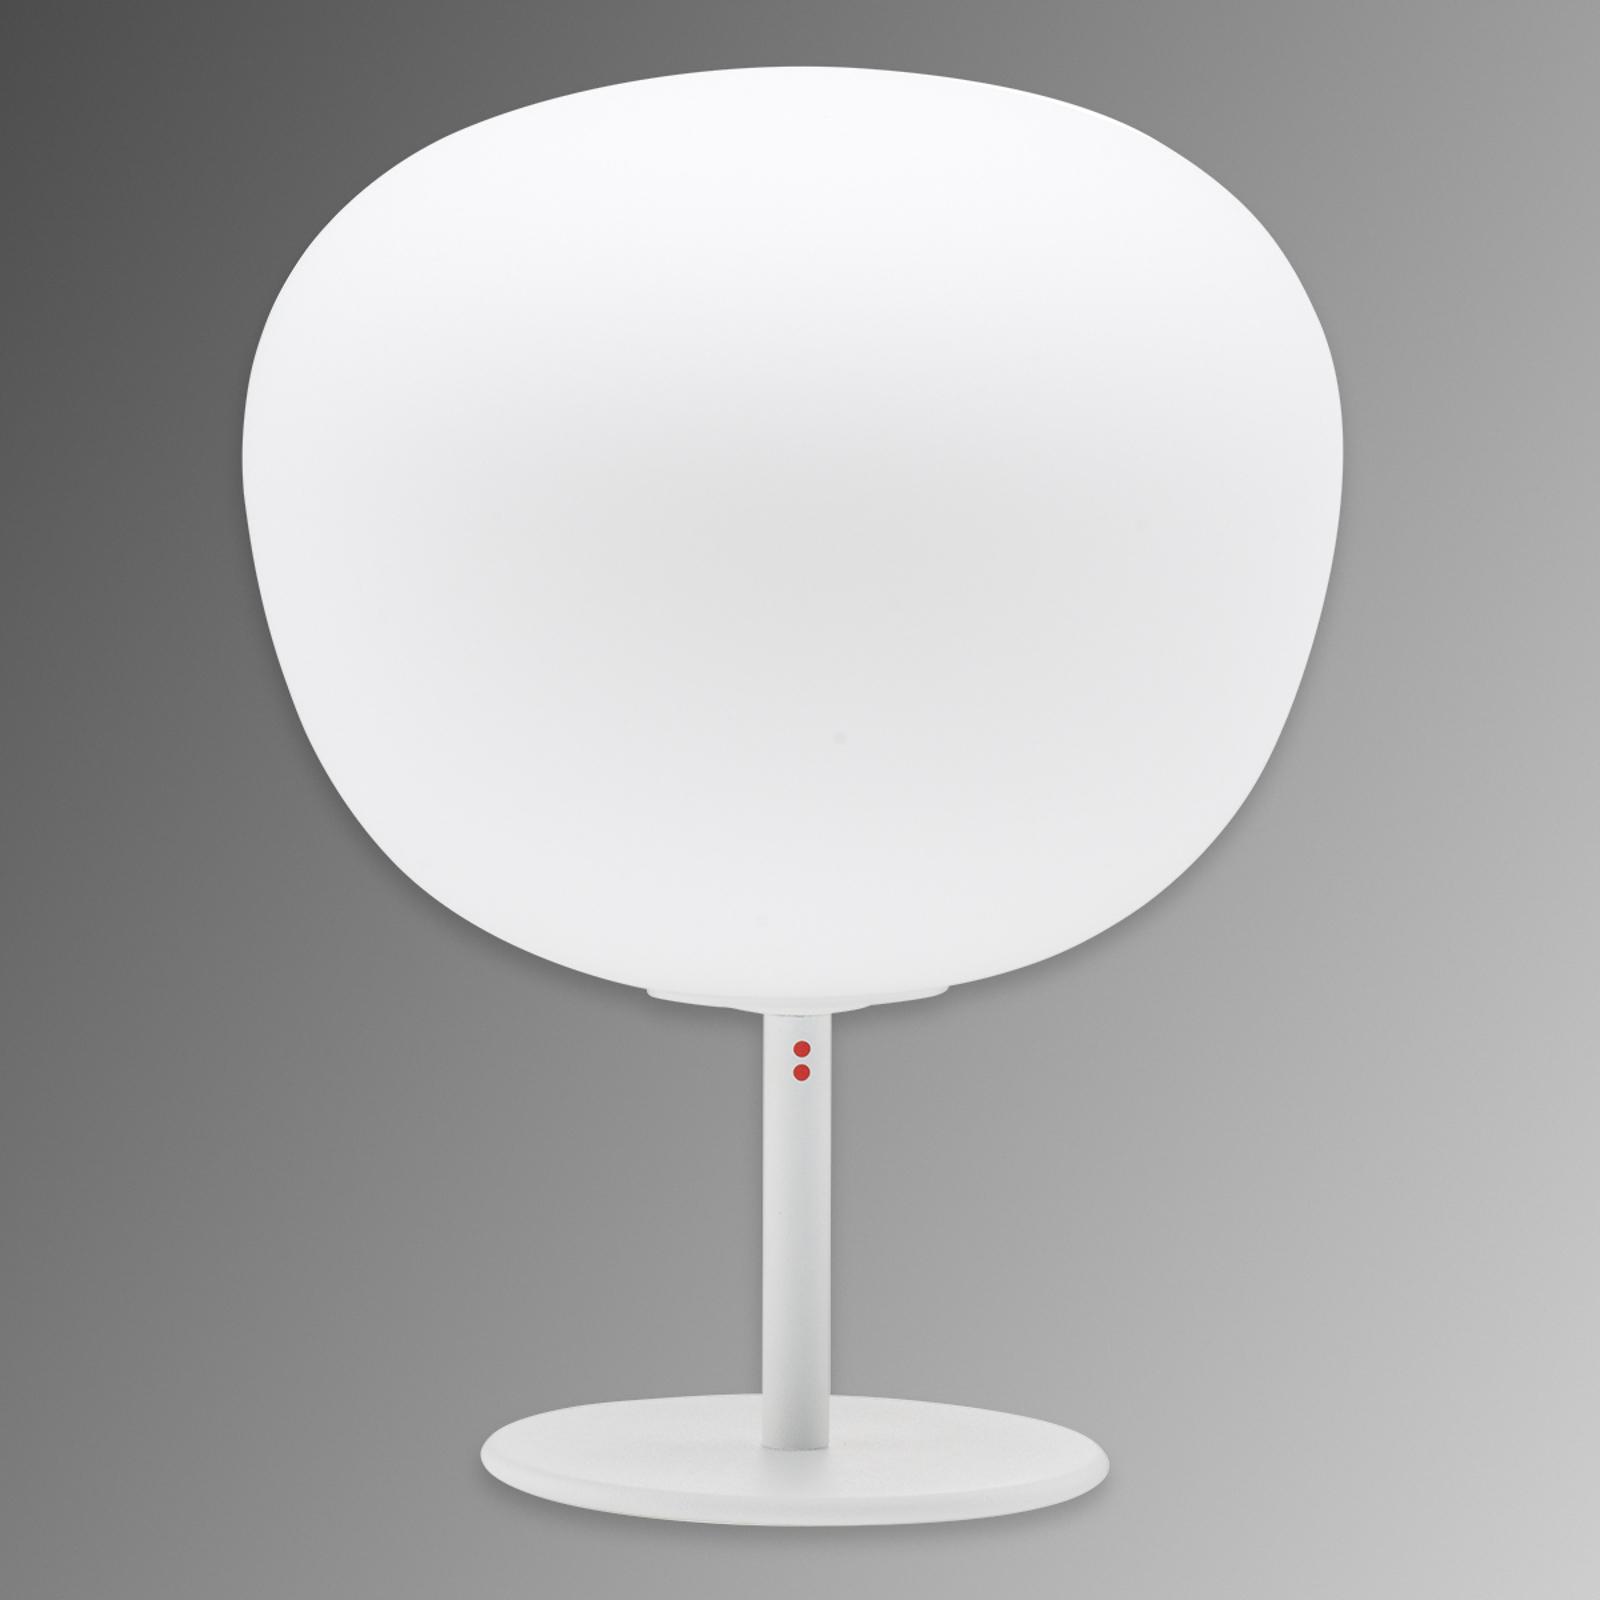 Fabbian Lumi Mochi lámpara de mesa, de pie, Ø 20cm